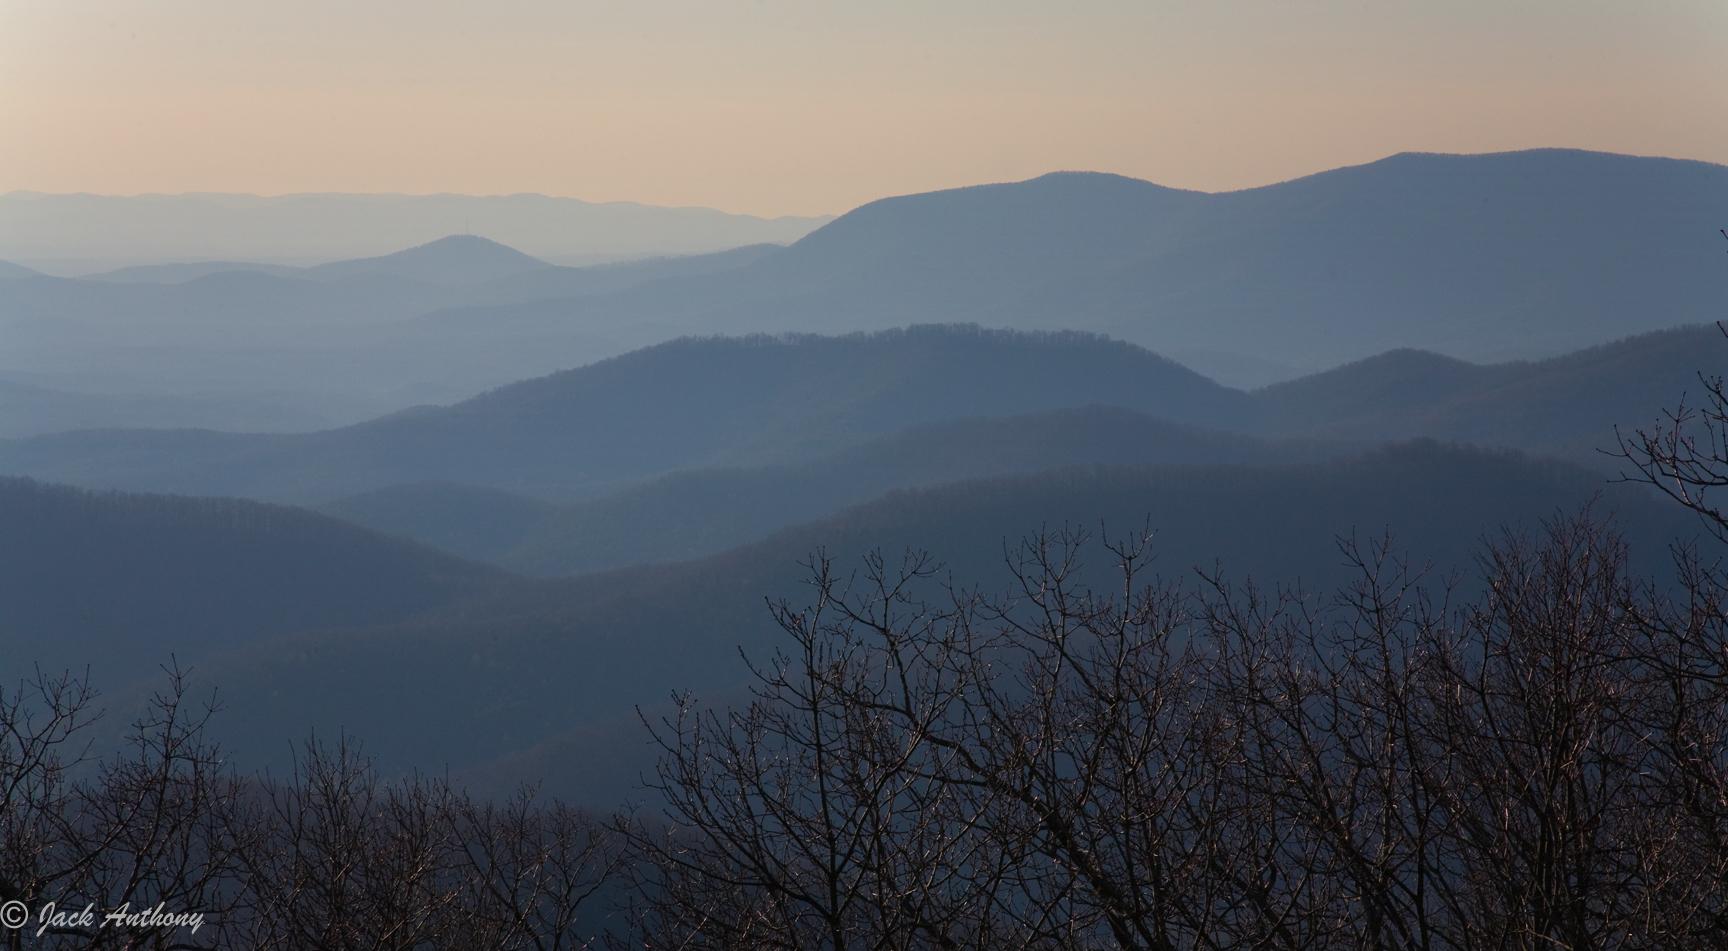 Rich Mountain Wildernes from Springer Mountain, GA.